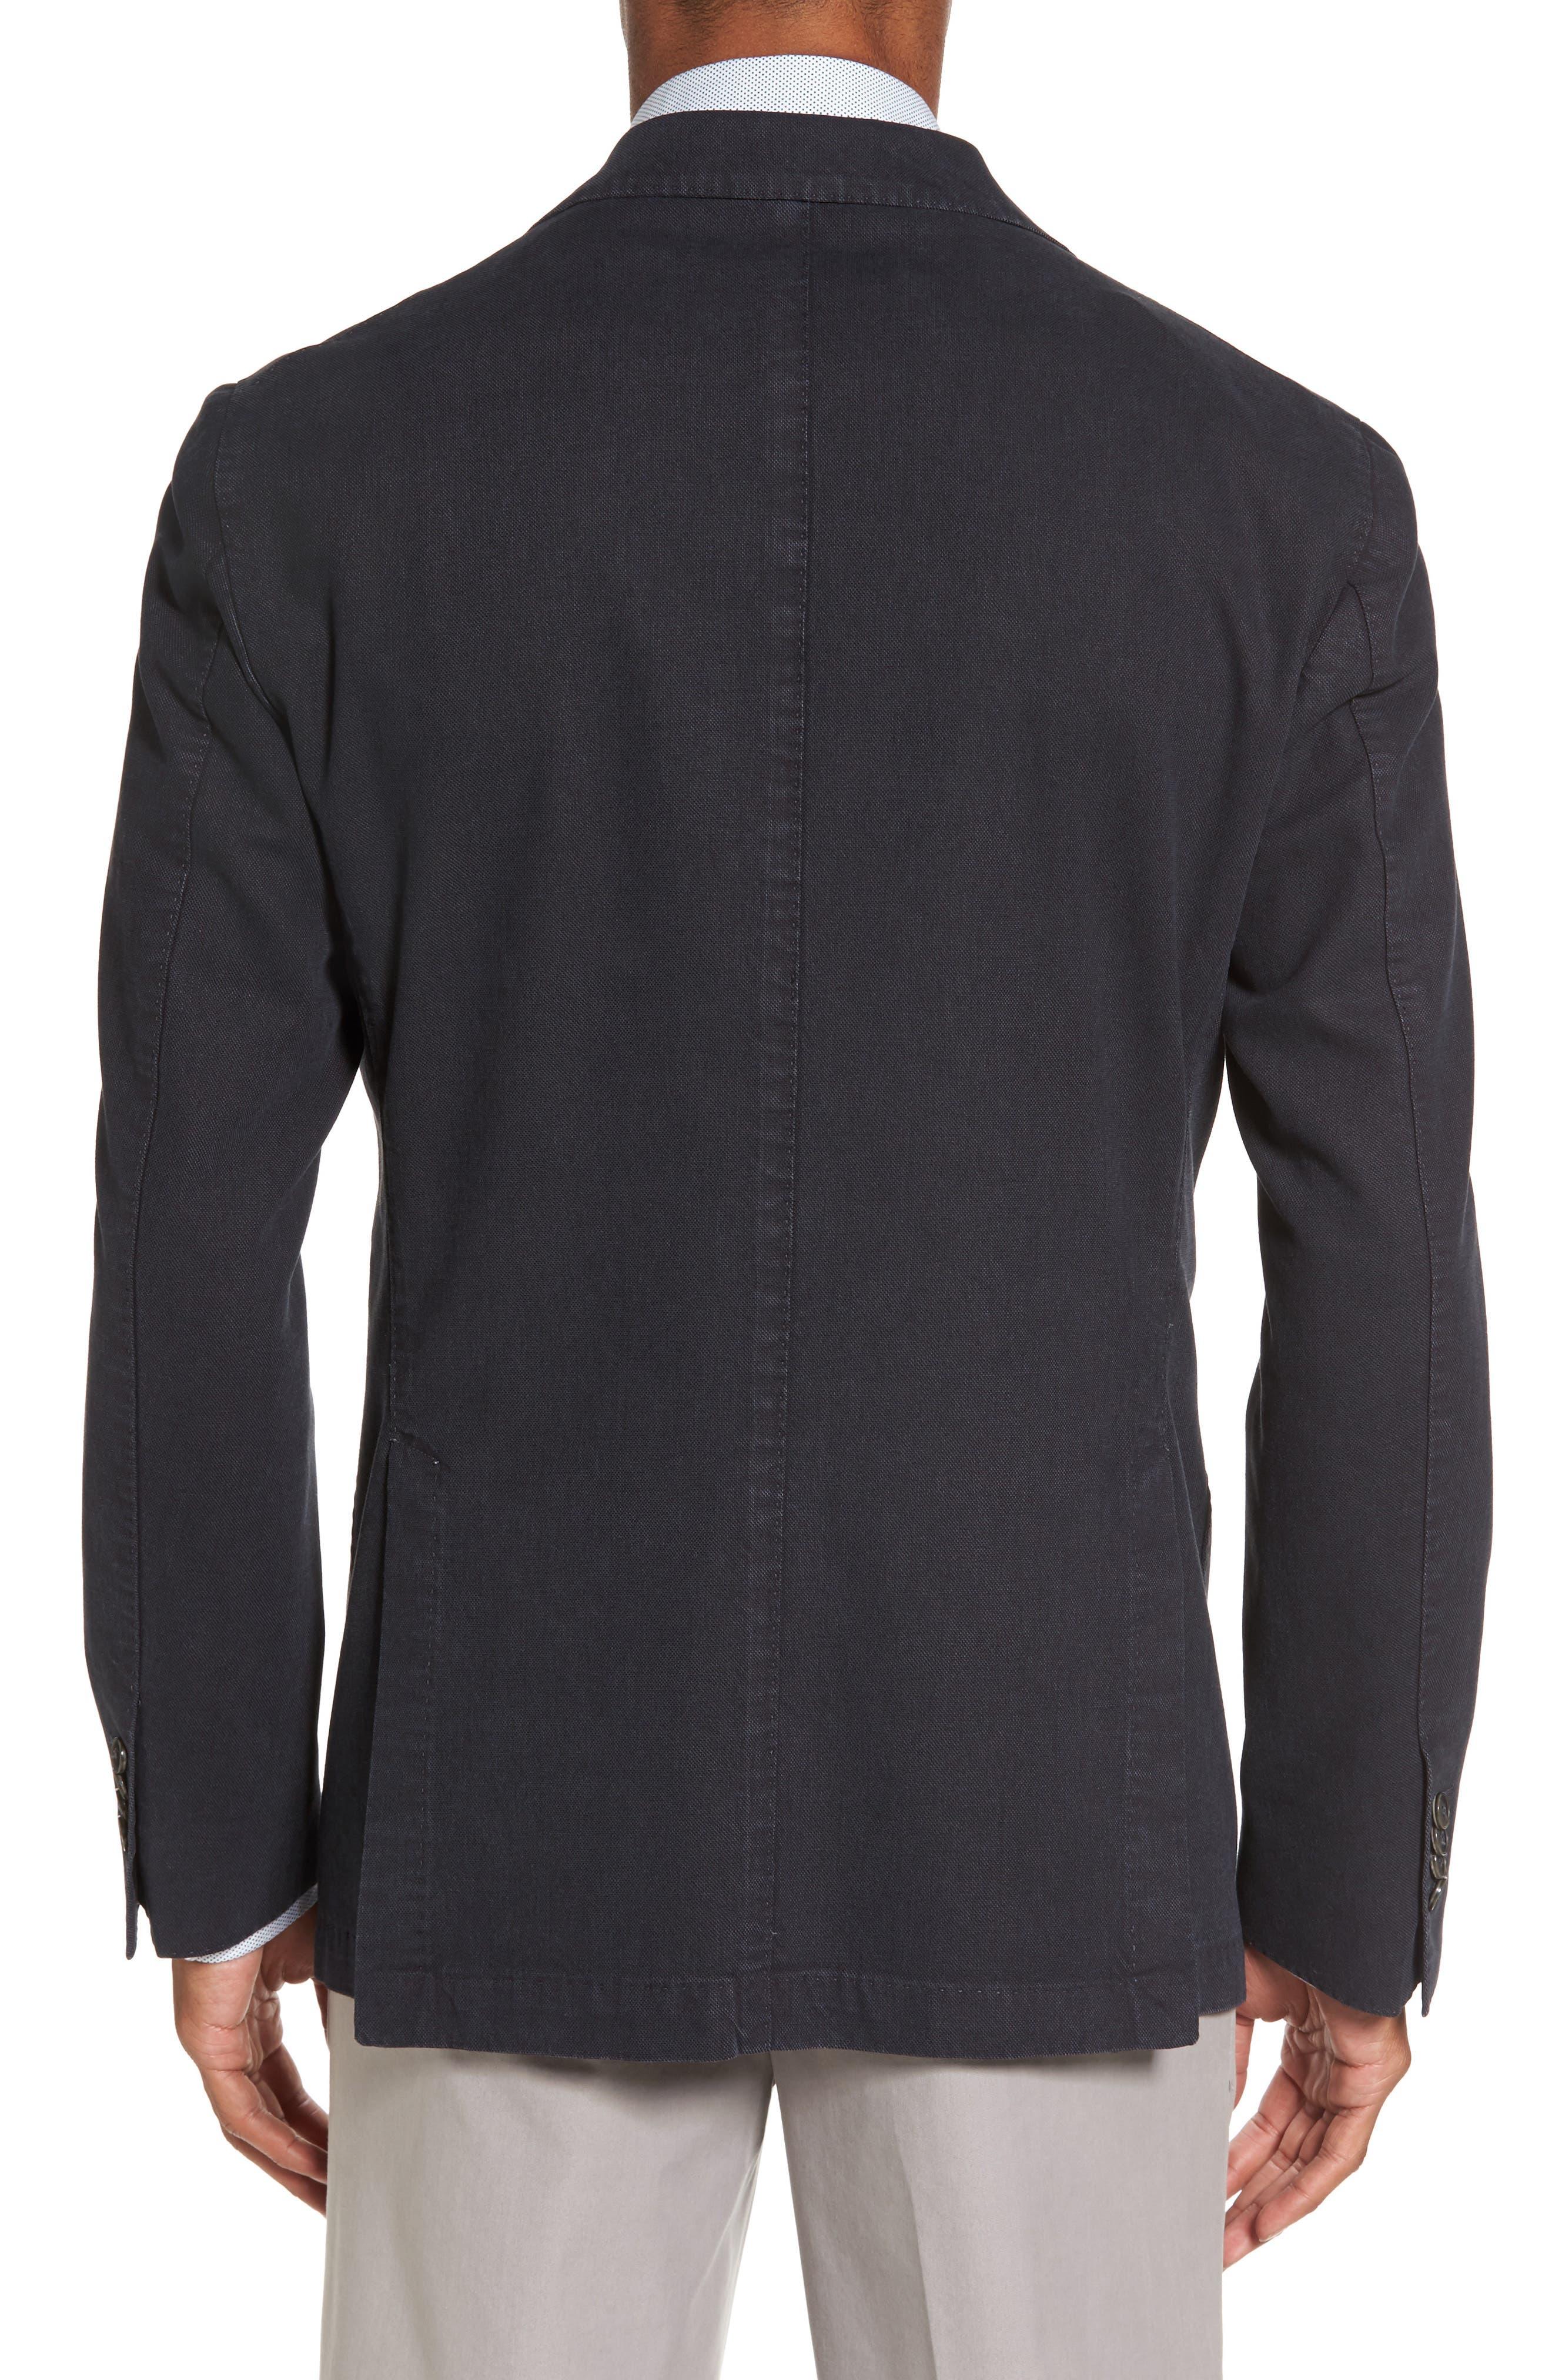 Alternate Image 2  - L.B.M. 1911 Classic Fit Cotton Blend Blazer